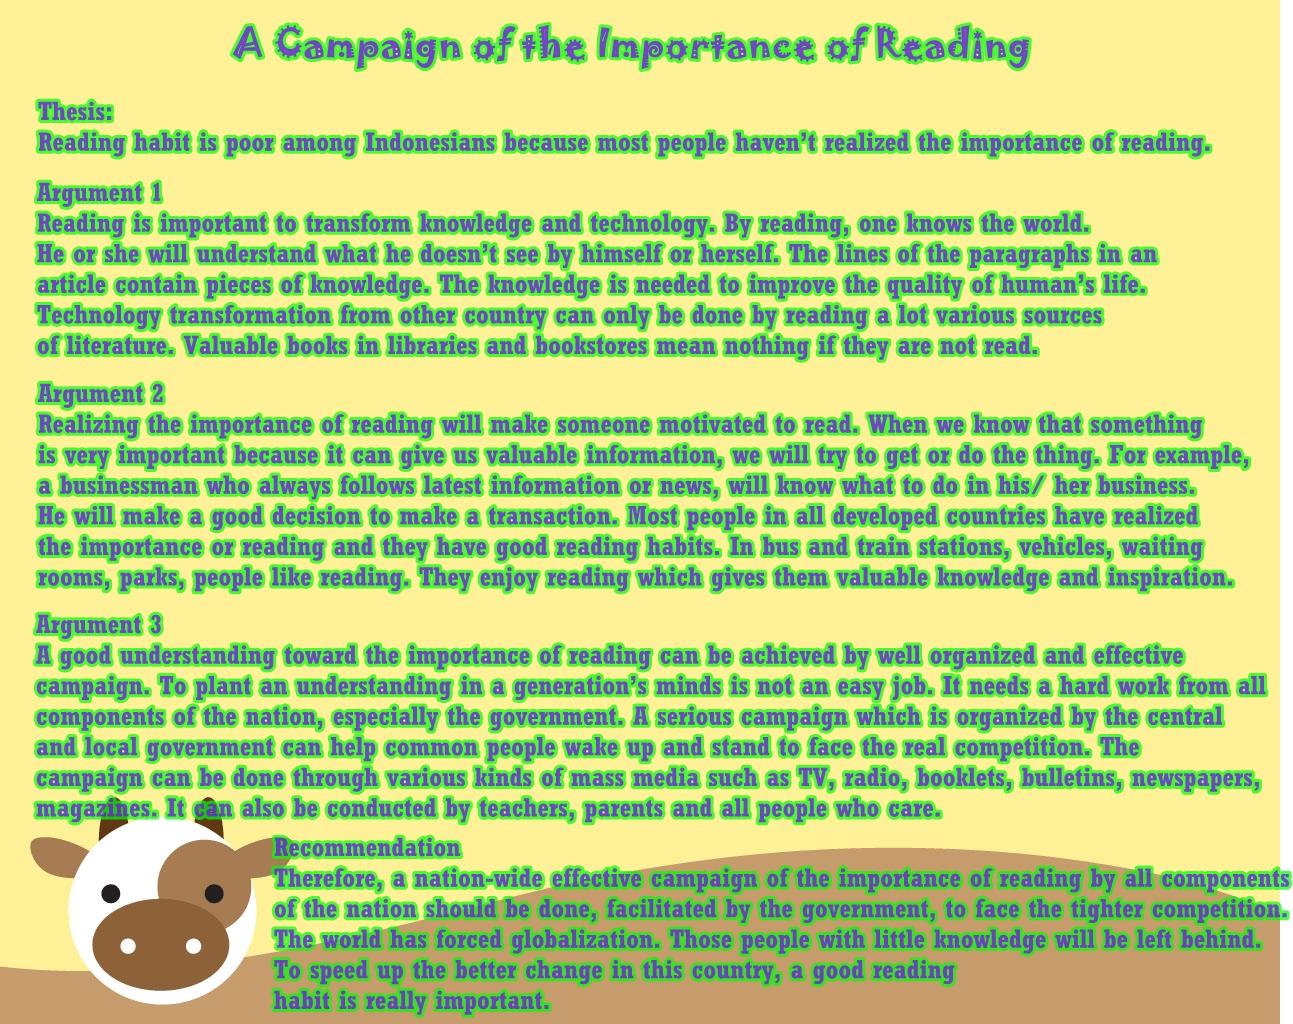 Contoh Teks Report Contoh Teks Report Tanaman Jambu Guava Exposition Text Pengertian Contoh Dan Generic Share The Knownledge